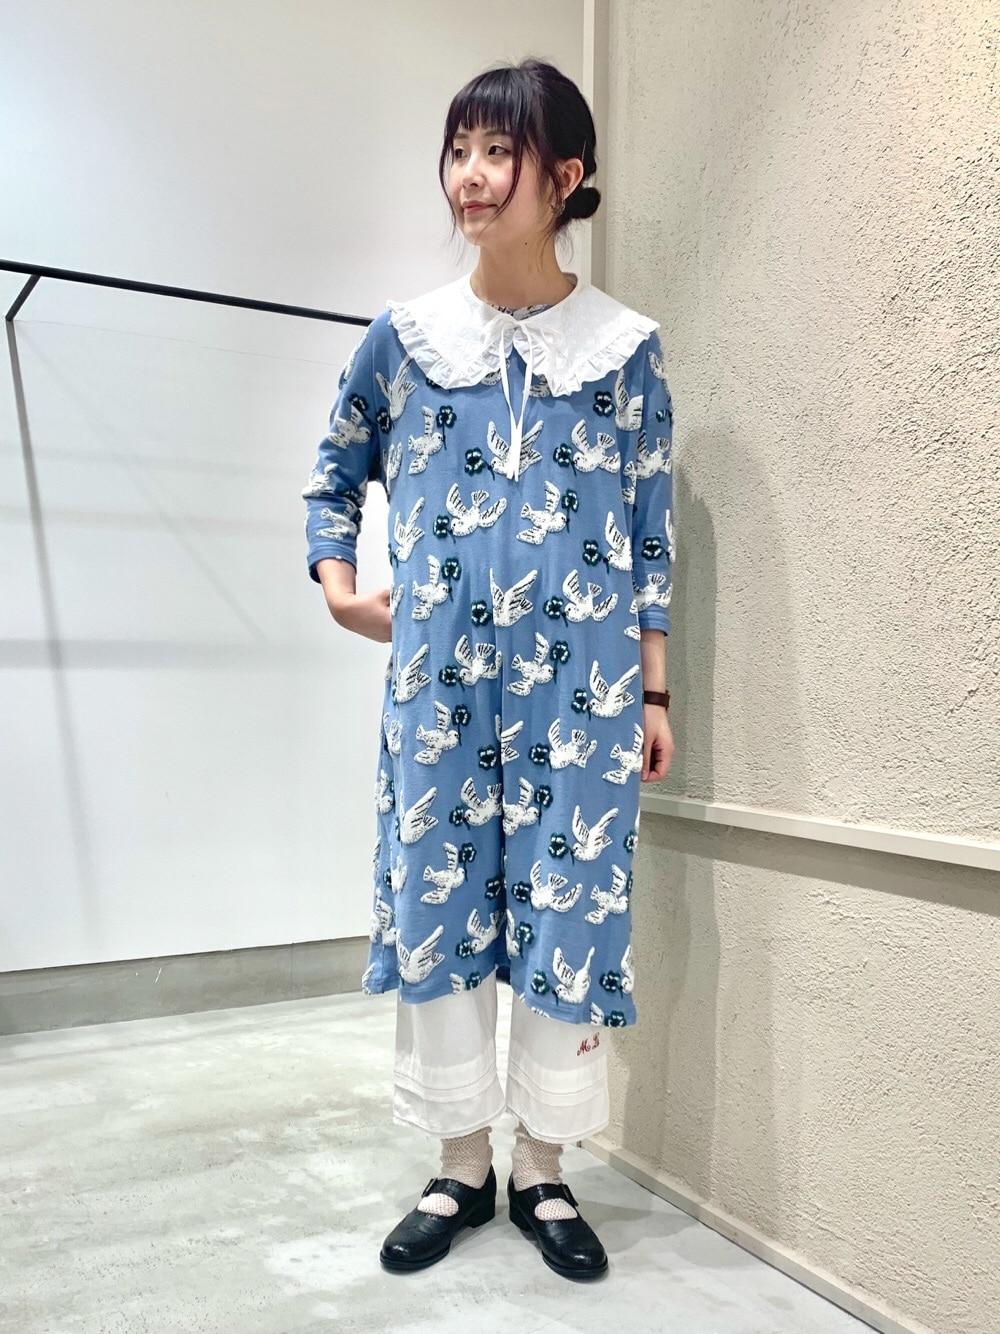 chambre de charme 横浜ジョイナス 身長:162cm 2021.02.12